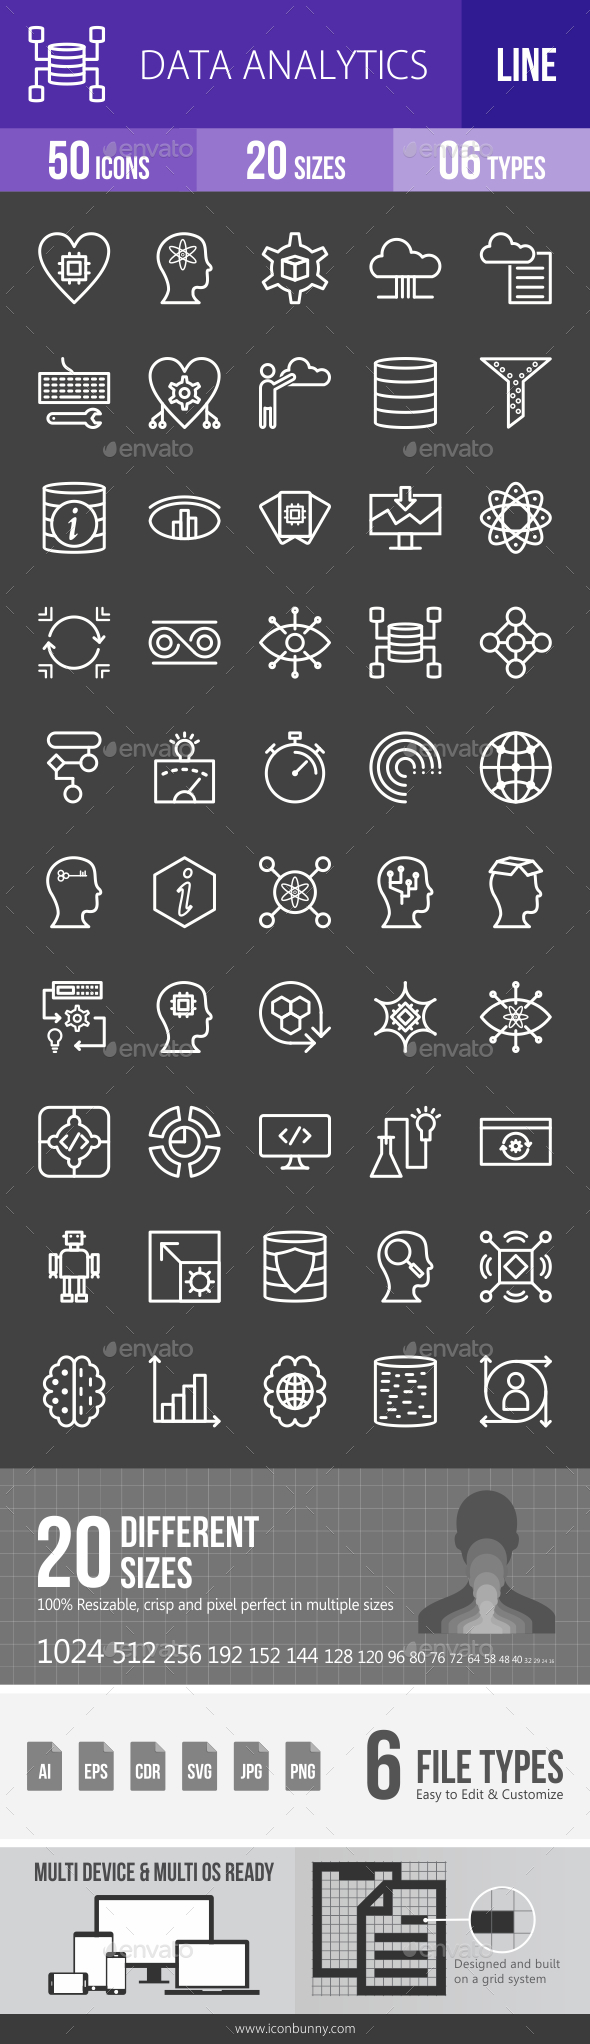 Data Analytics Line Inverted Icons - Icons